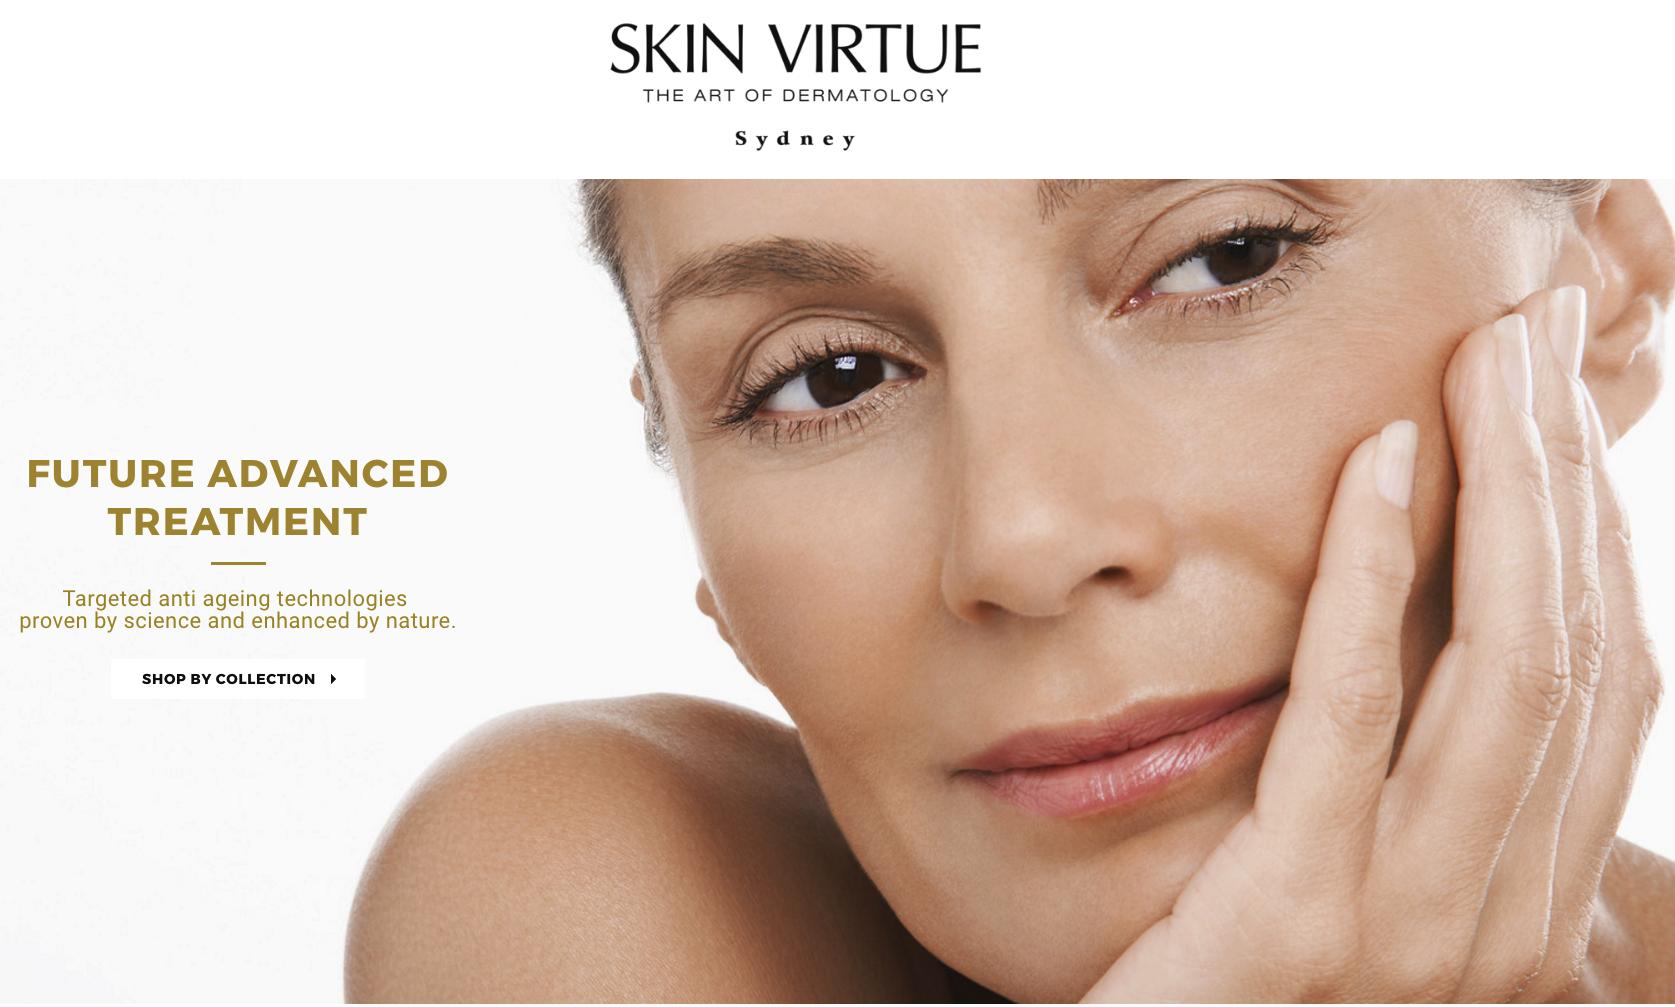 About Skin Virtue Skin Care Skin Skin Care Virtue